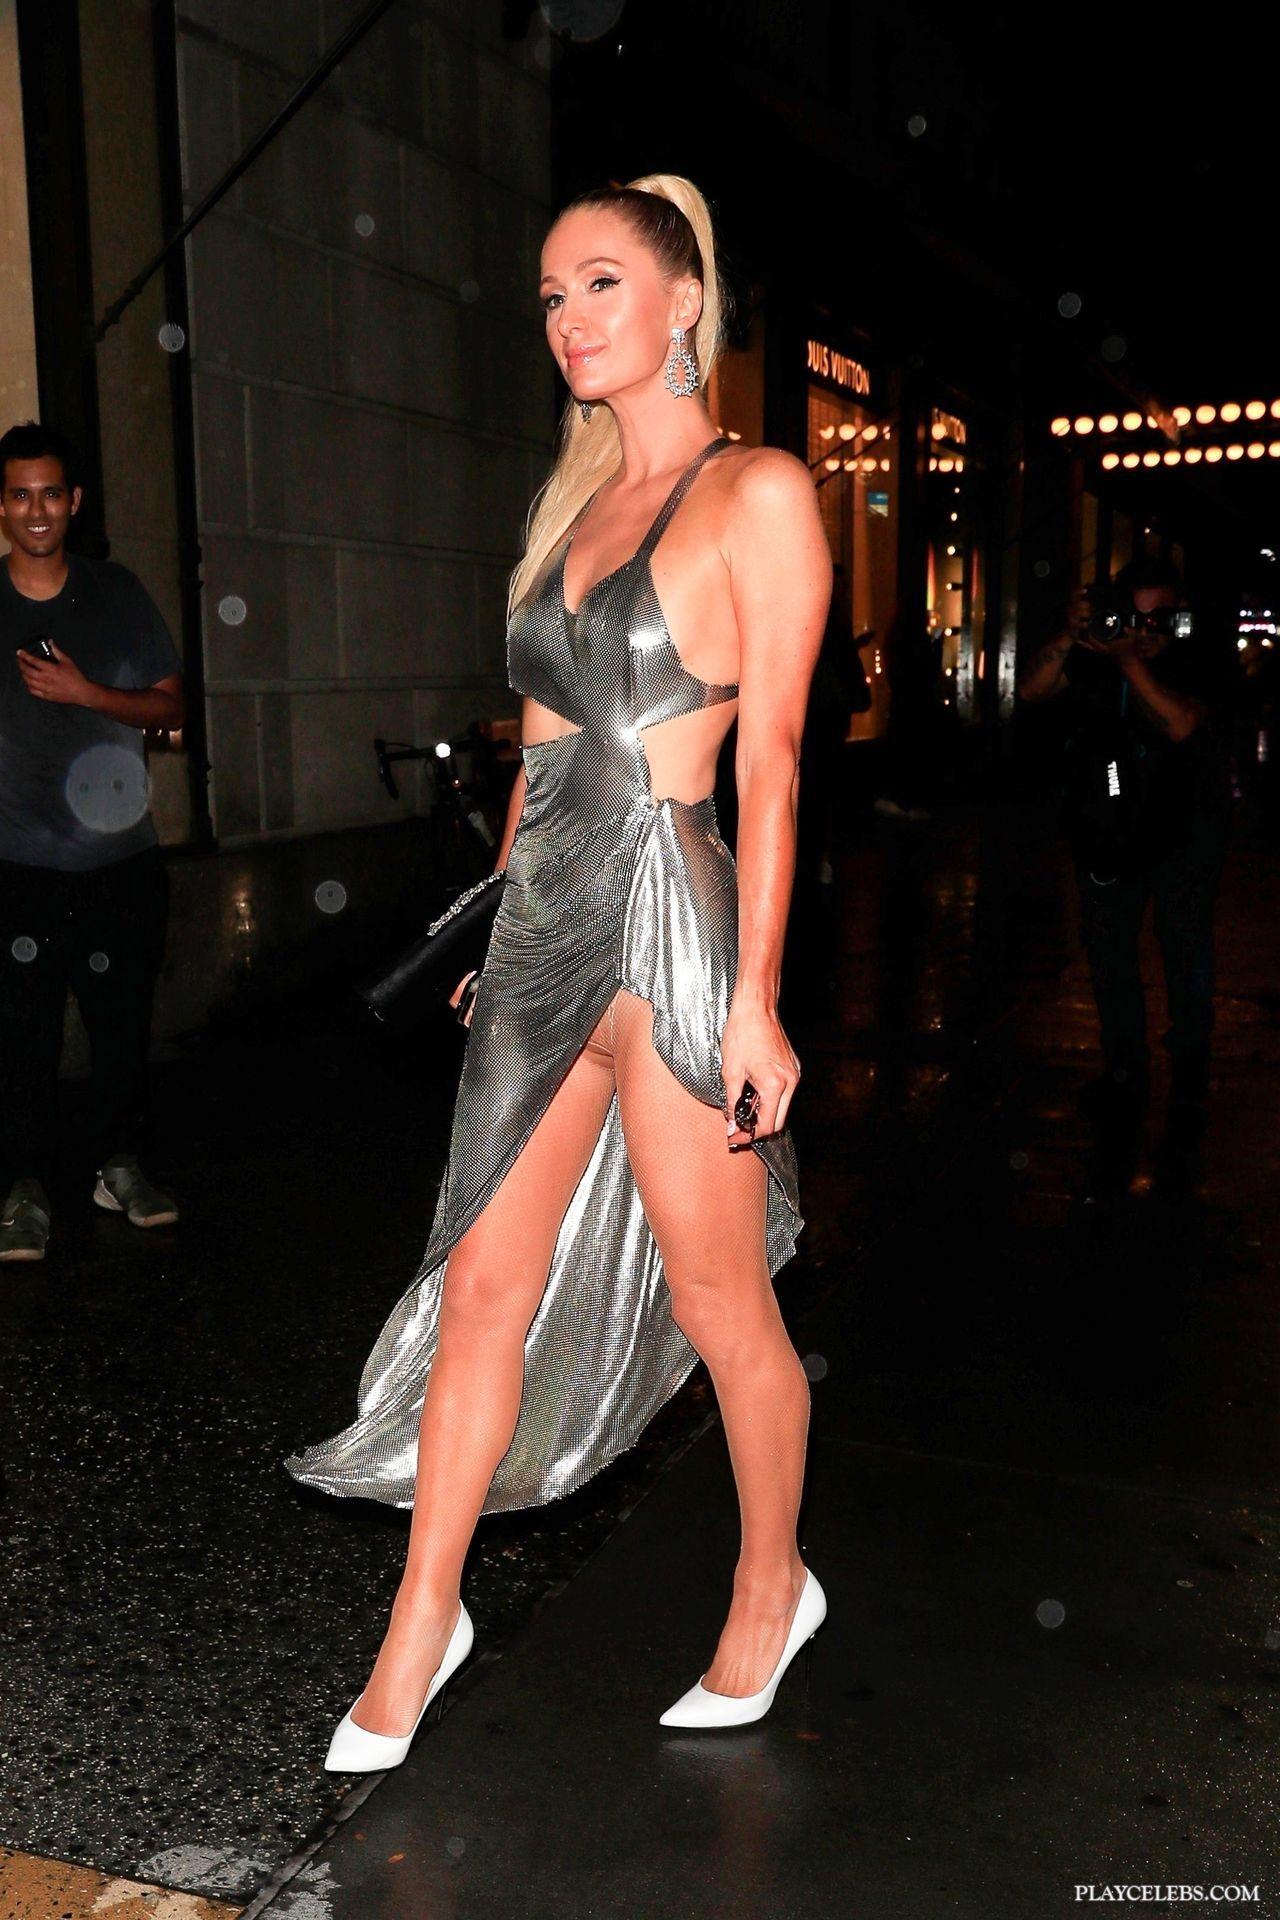 Paris Hilton Paparazzi Upskirt Oops Photos